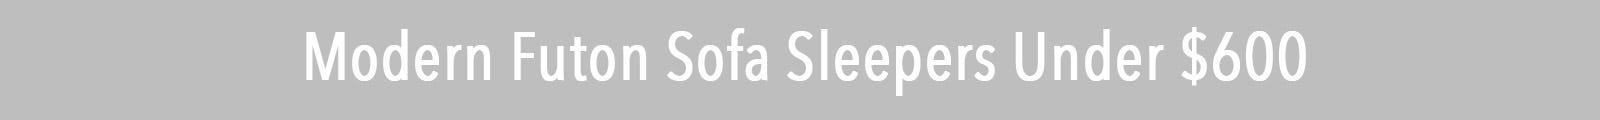 Modern Futon Sofa Sleepers Under $600